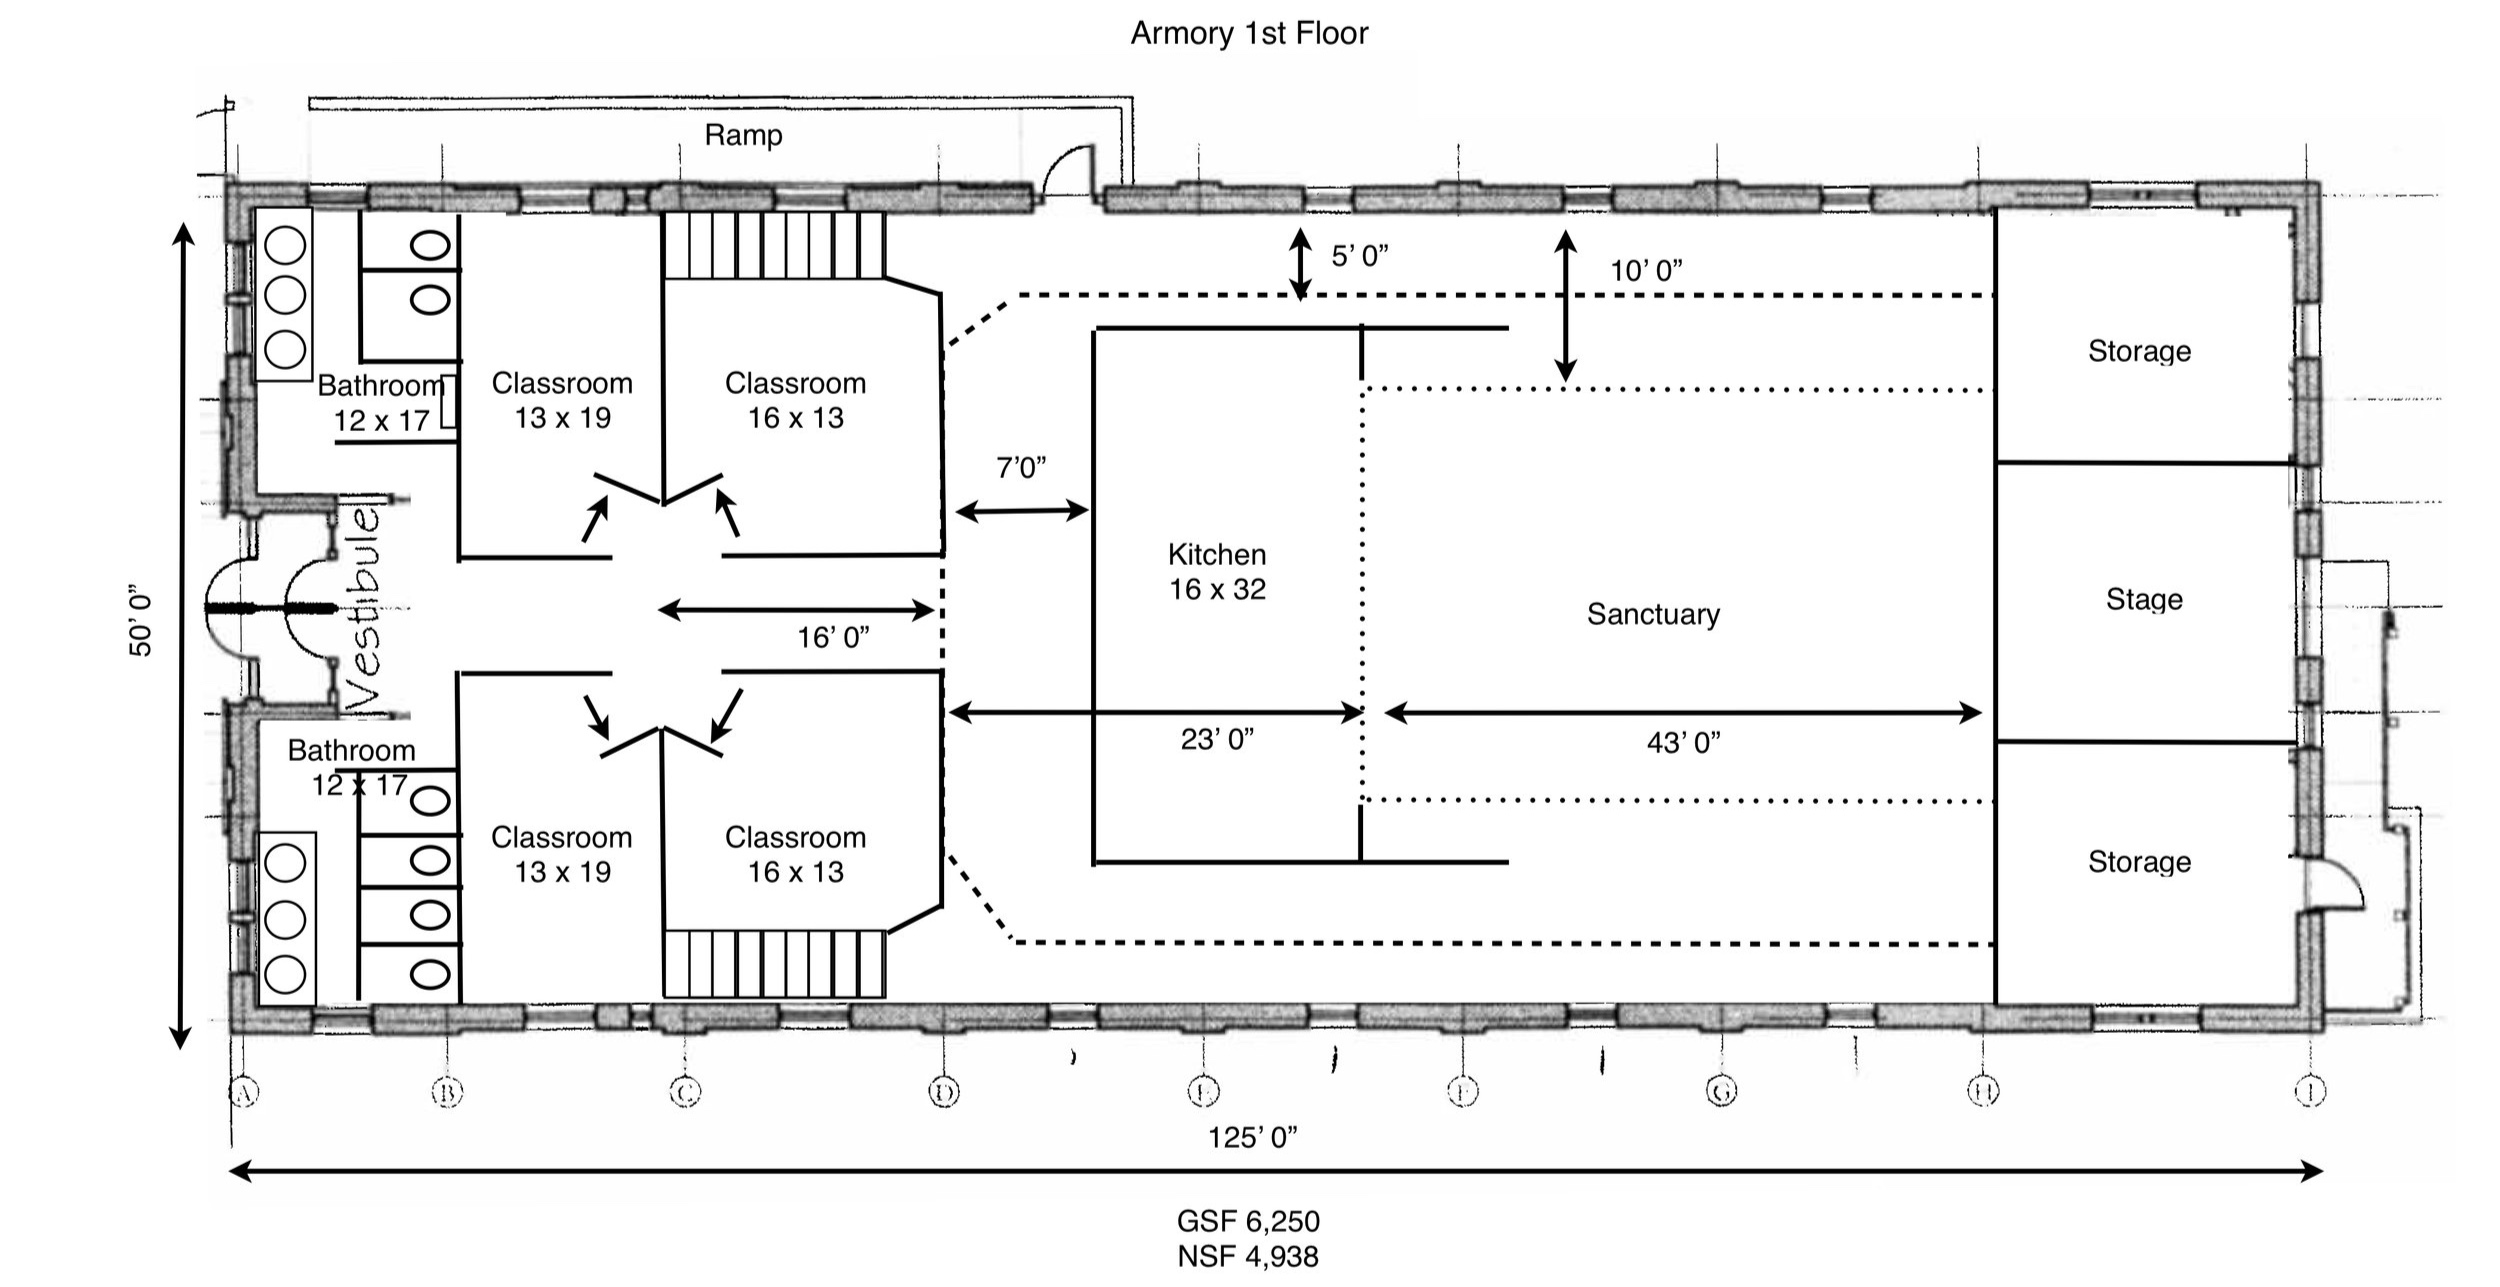 Armory+Blueprint+Full+Main+Floor.jpg